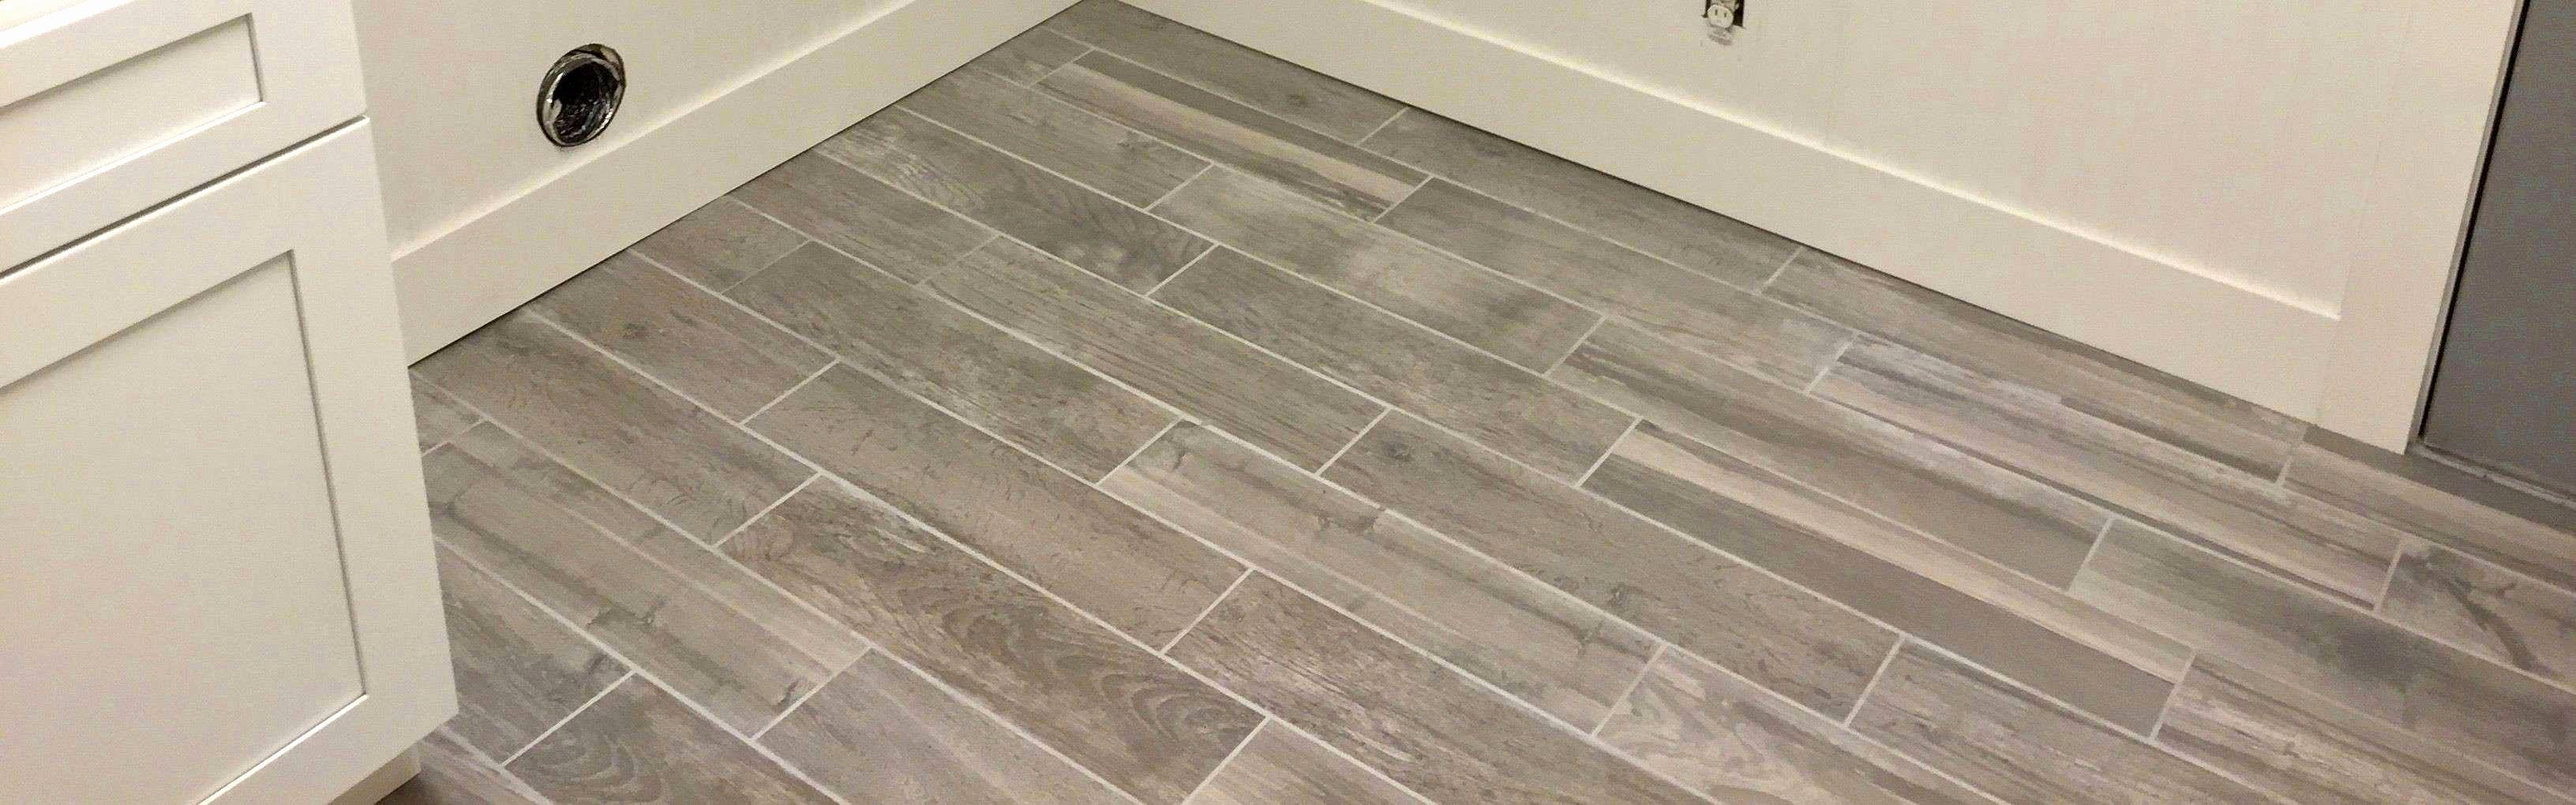 21 Unique Cost to Install Hardwood Floors Lumber Liquidators